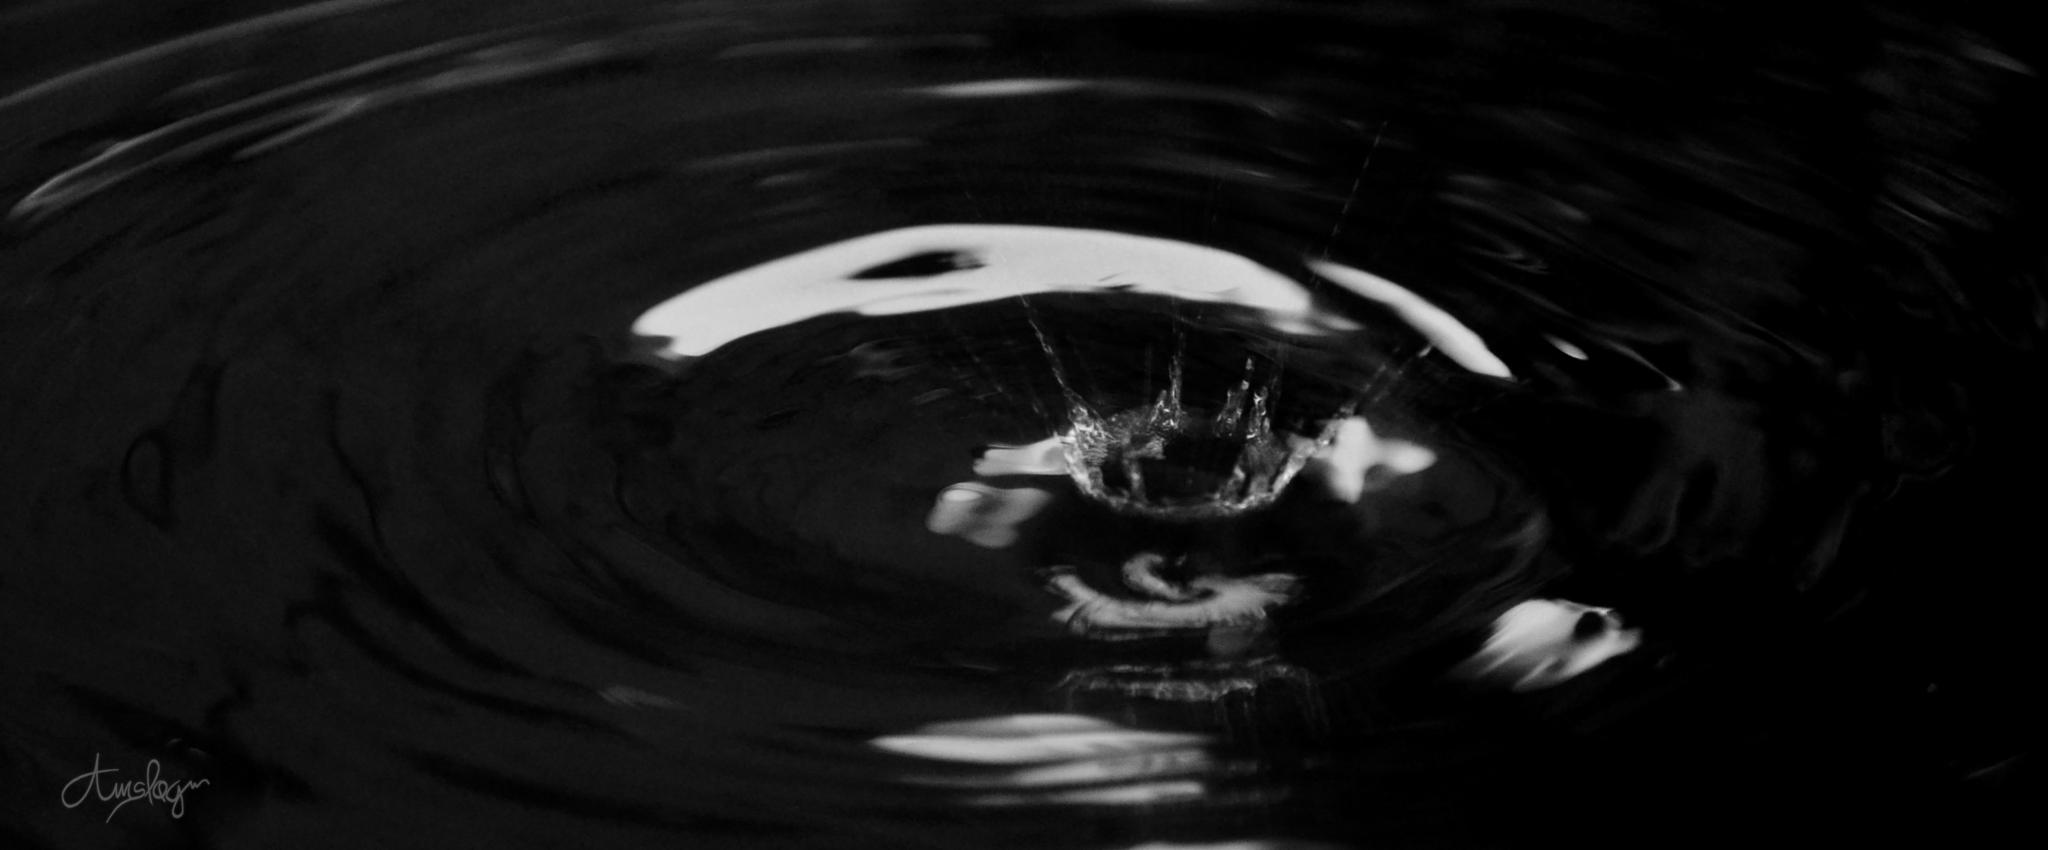 Splash by Genedad